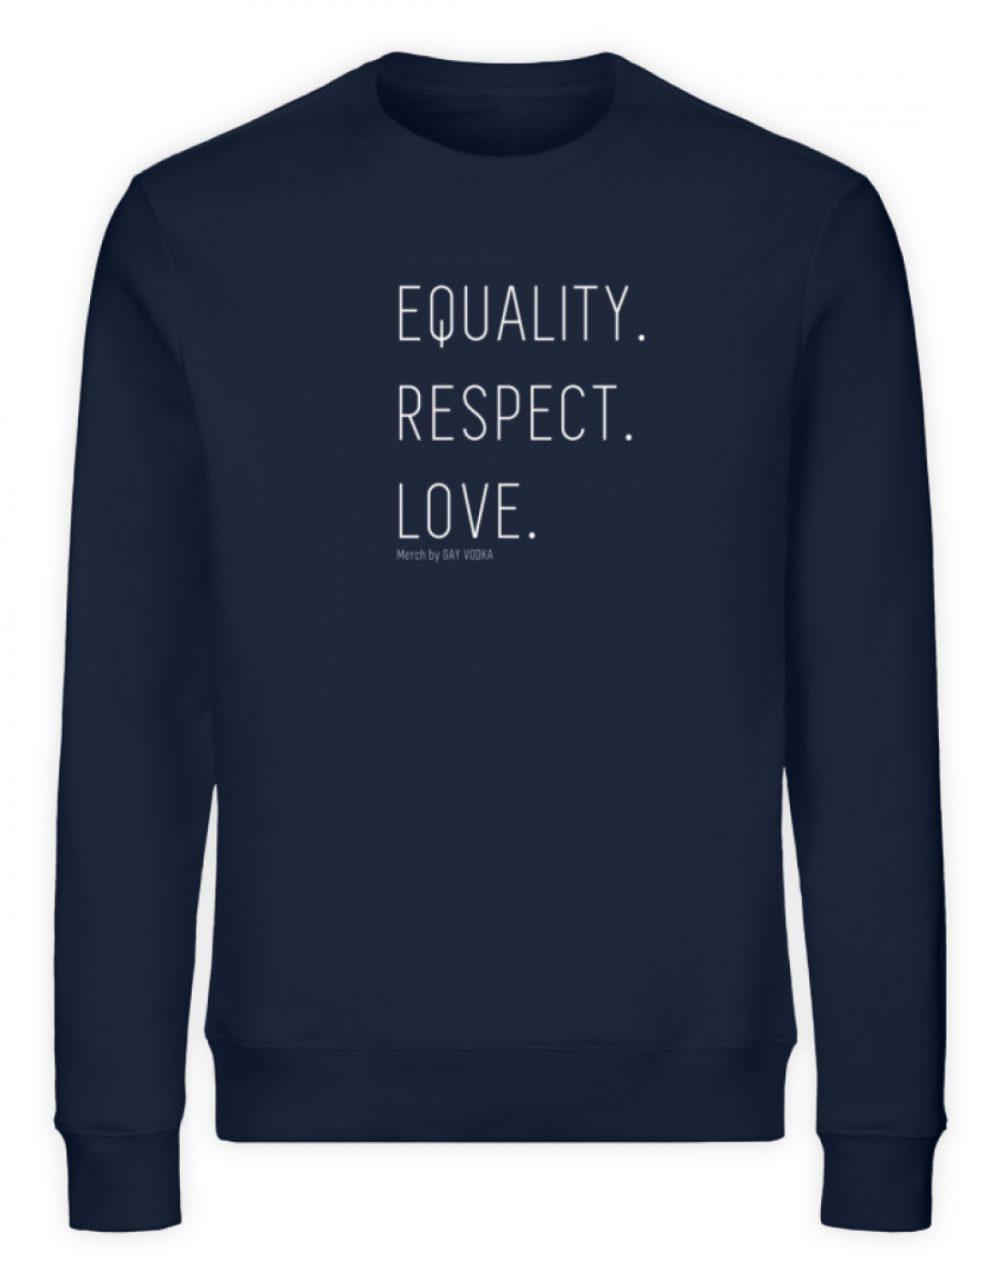 EQUALITY. RESPECT. LOVE. - Unisex Organic Sweatshirt-6887